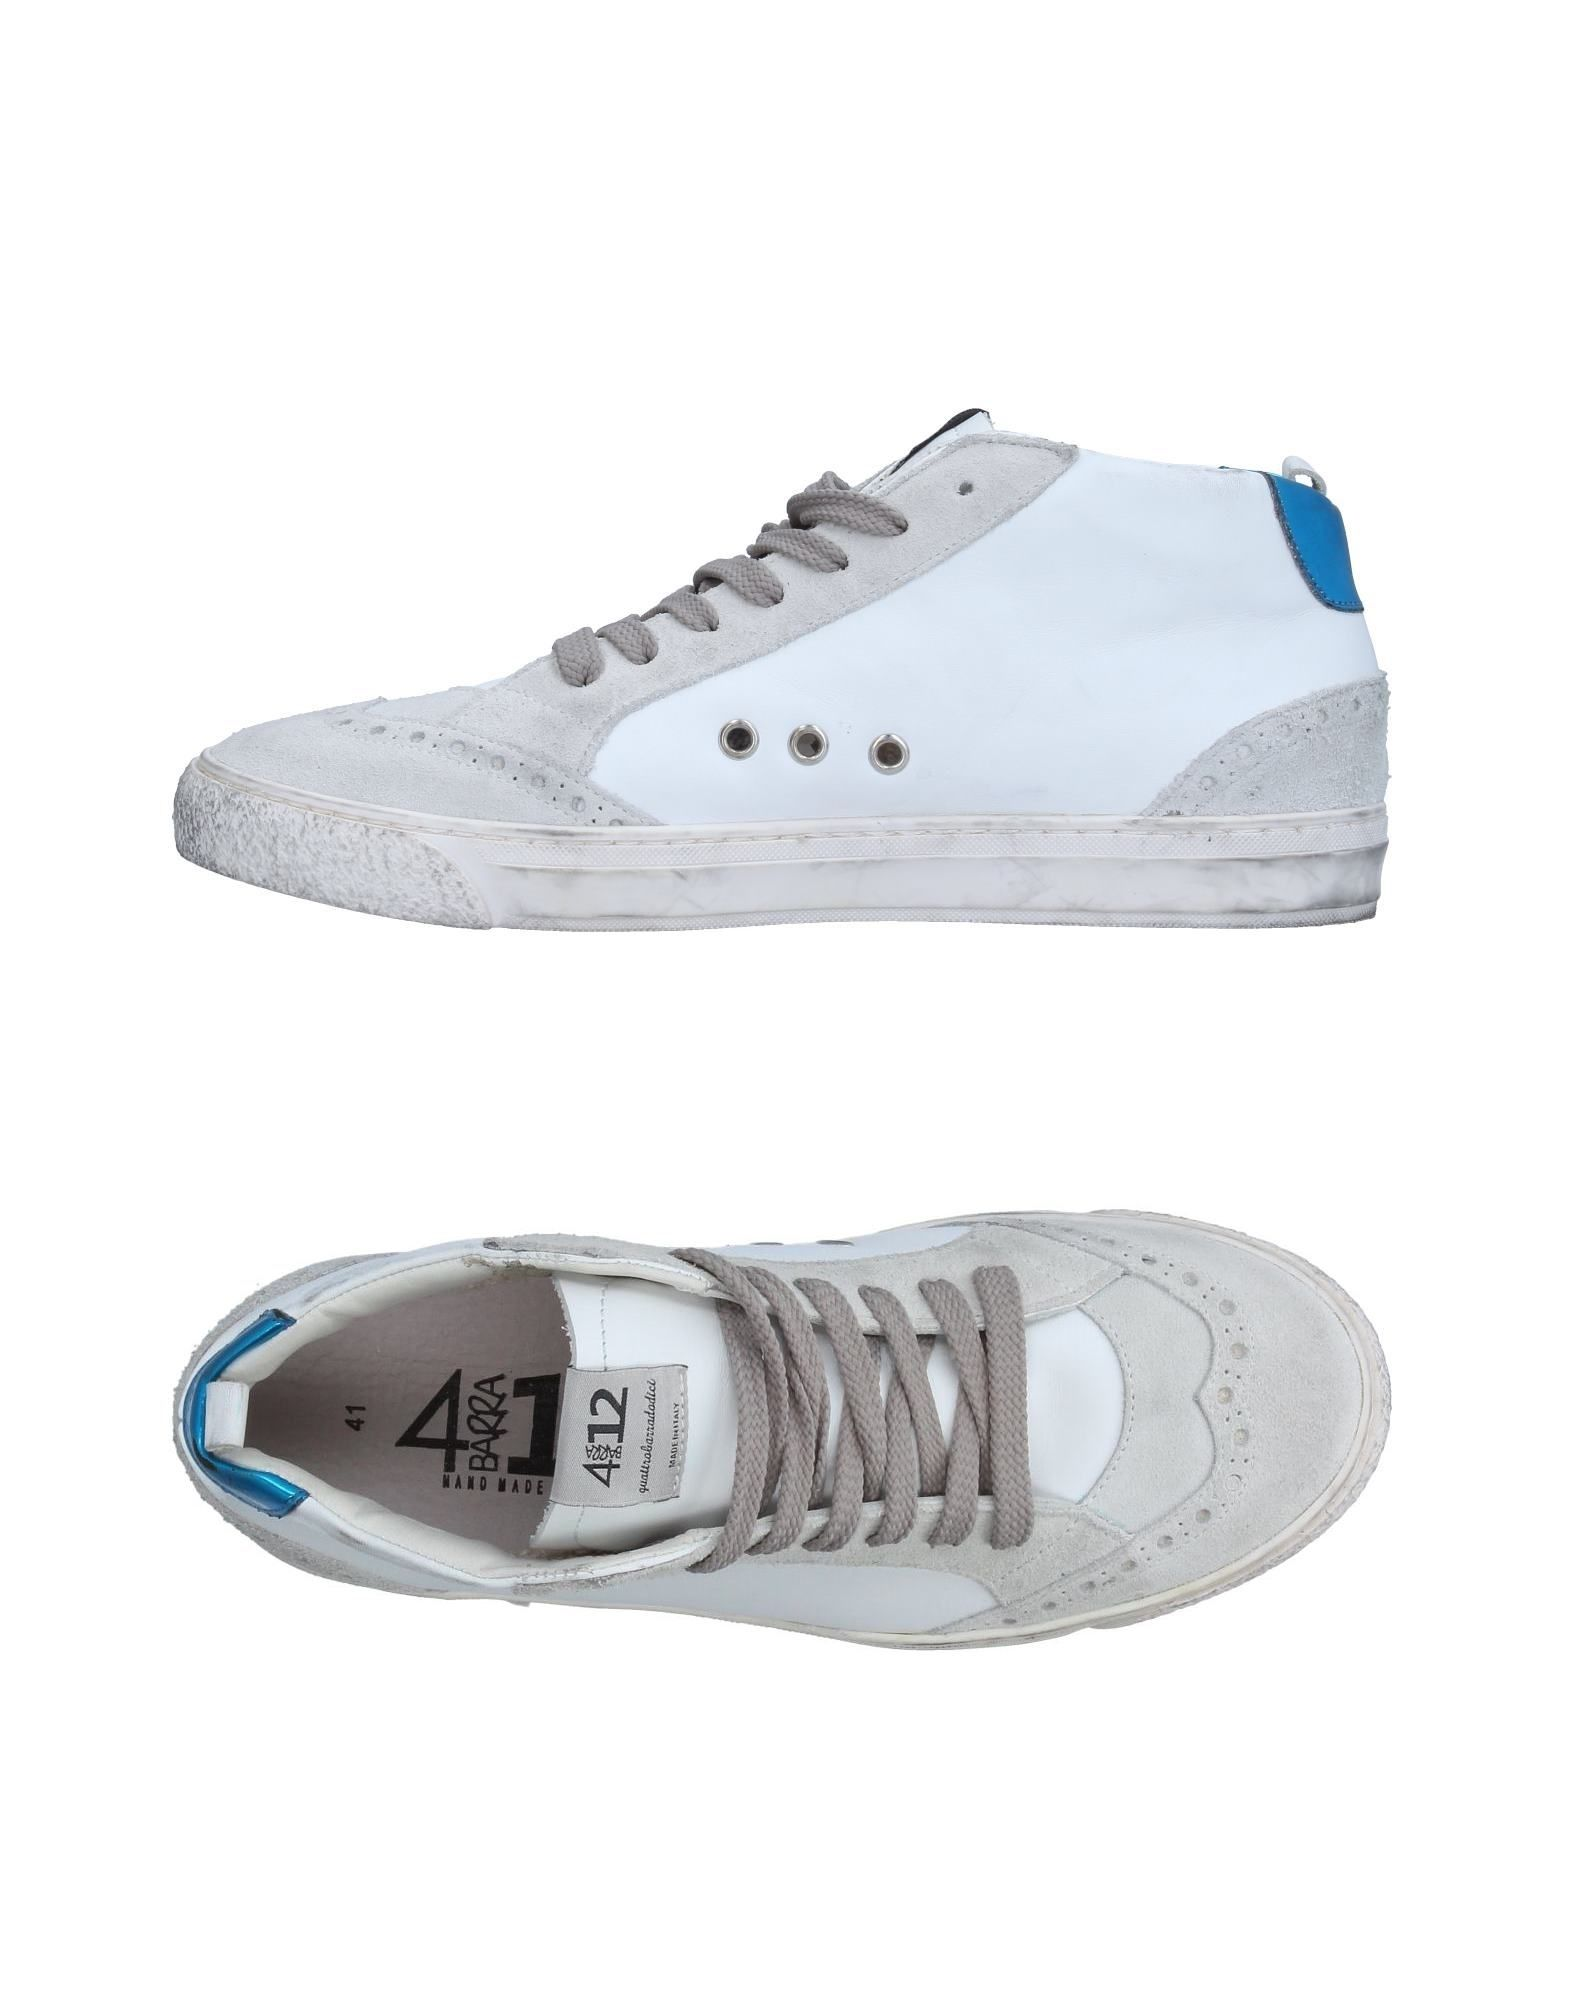 QUATTROBARRADODICI Высокие кеды и кроссовки кеды кроссовки высокие dc council mid tx stone camo